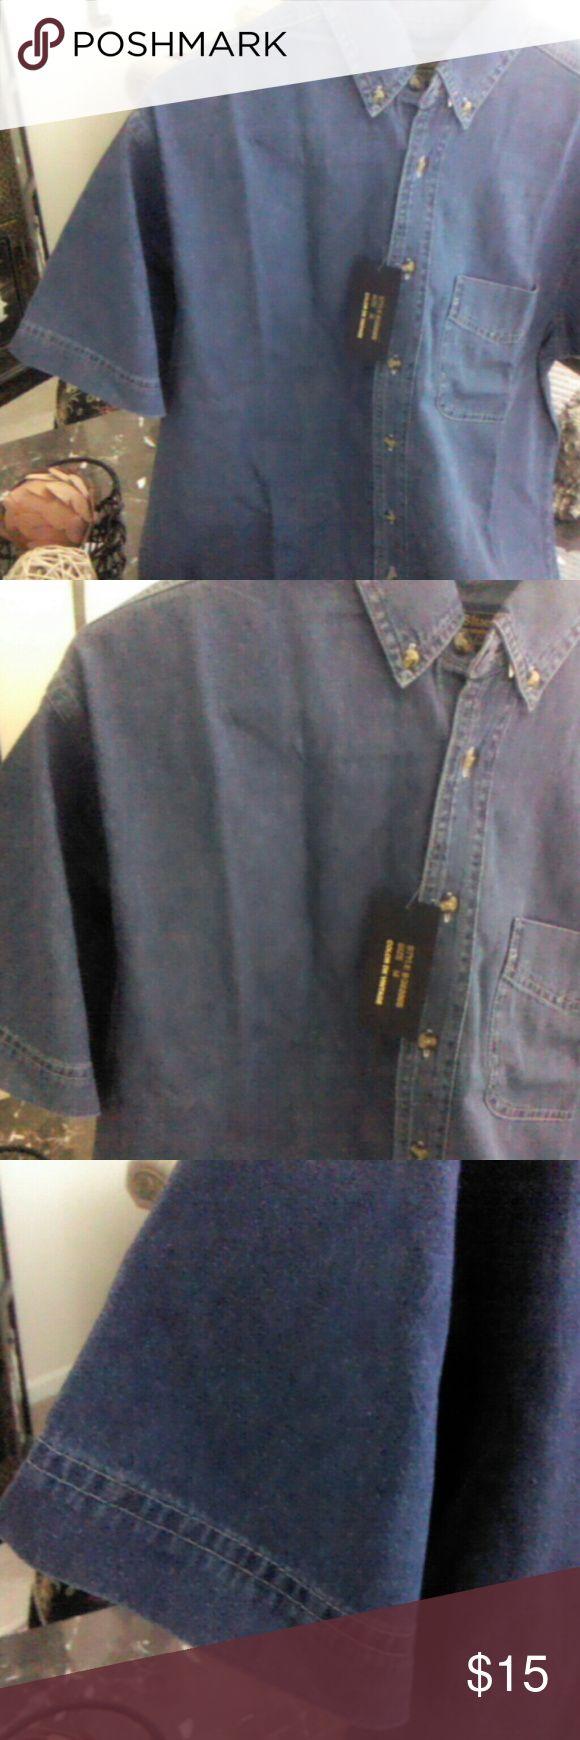 Short sleeve jean shirt for men Blue jean, pocket, button down, & short sleeves Tops Button Down Shirts